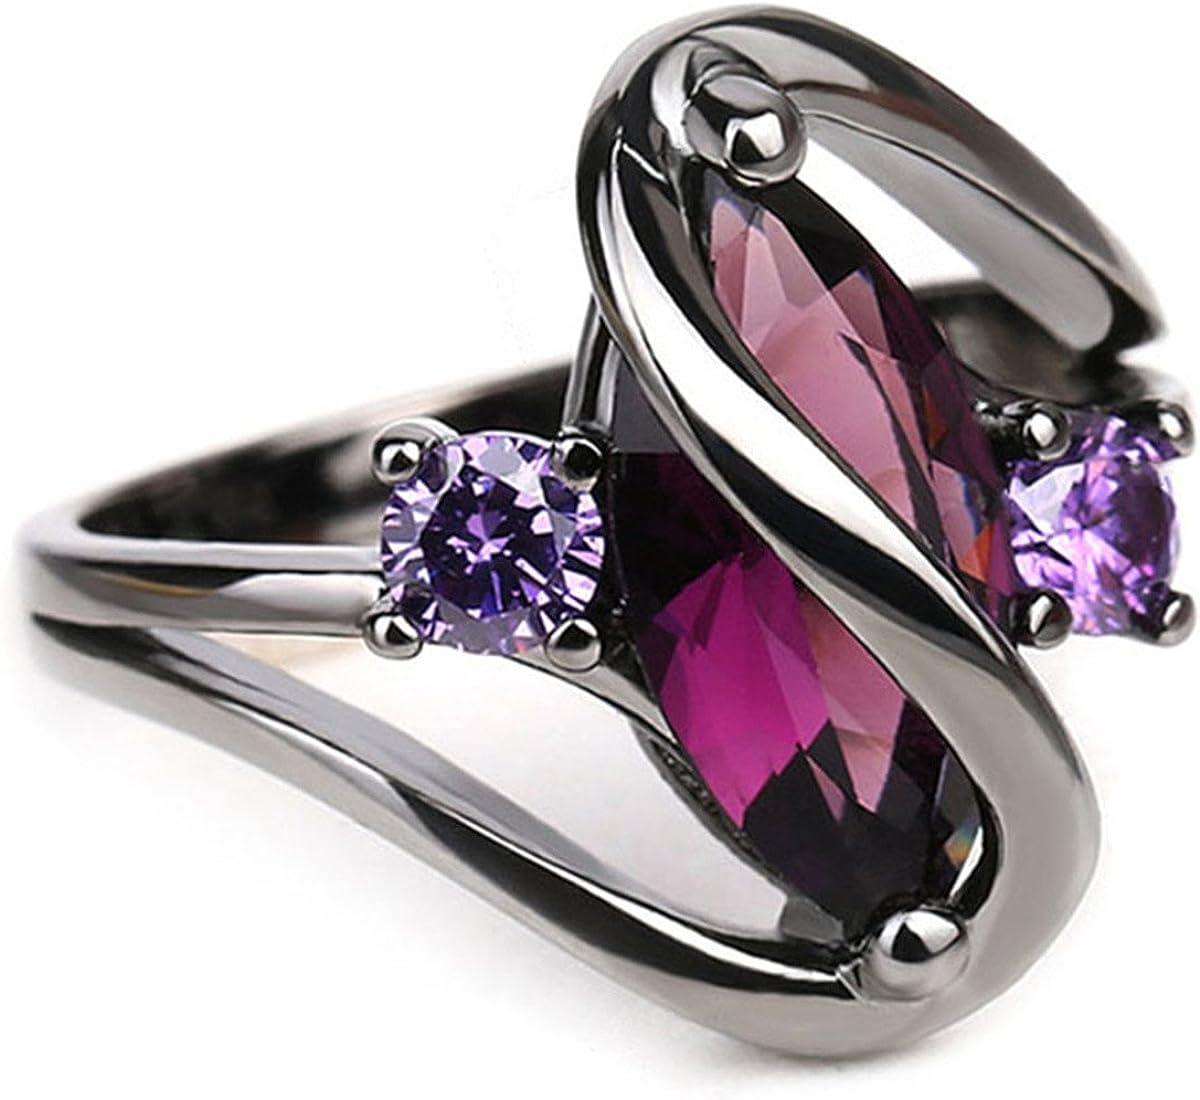 ECYC Trendy Engagement Wedding Rings Women Eye Black Deluxe Go Horse Cz famous